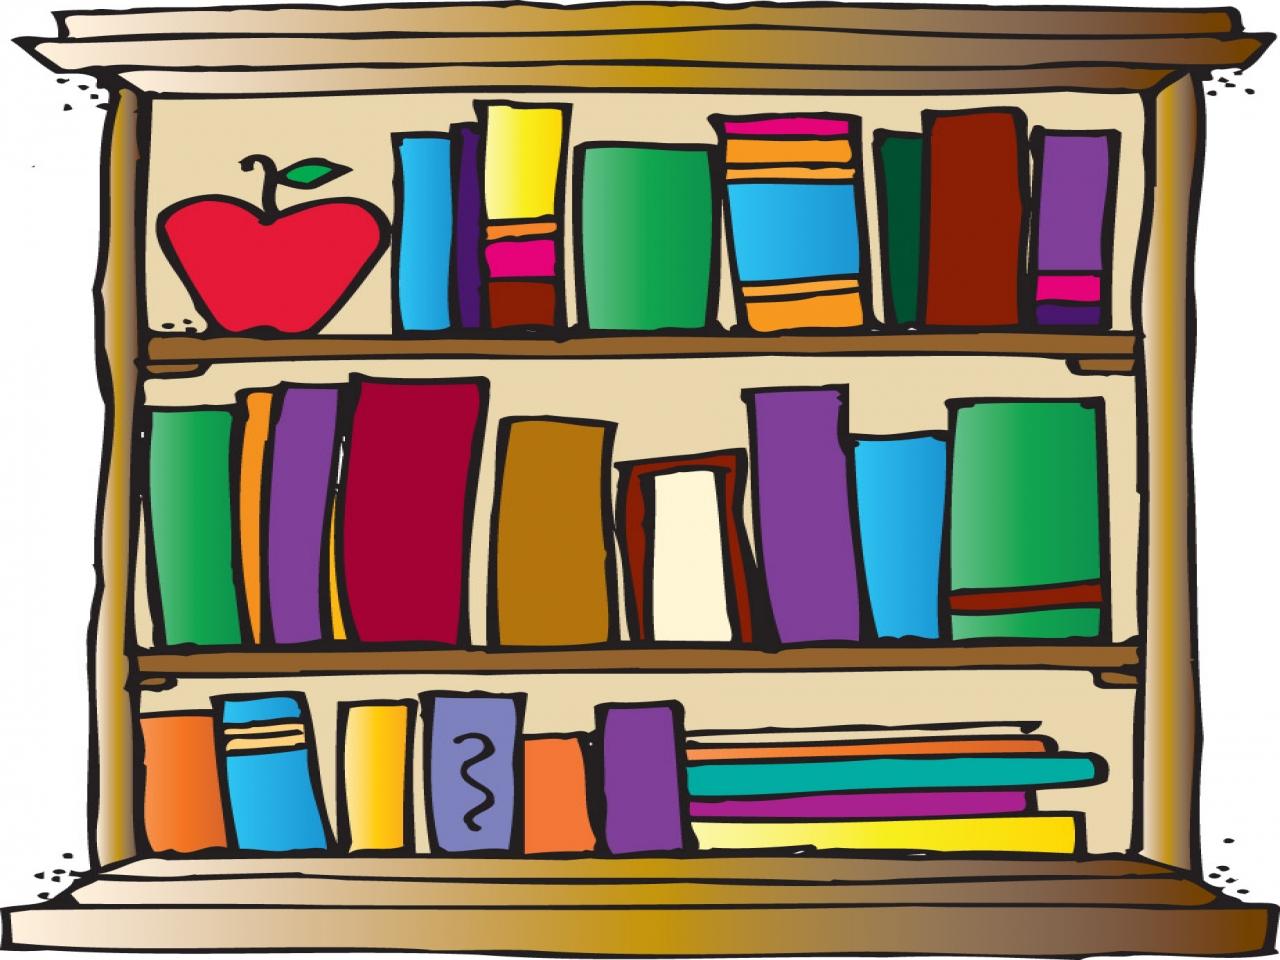 Clipart bookshelf design.